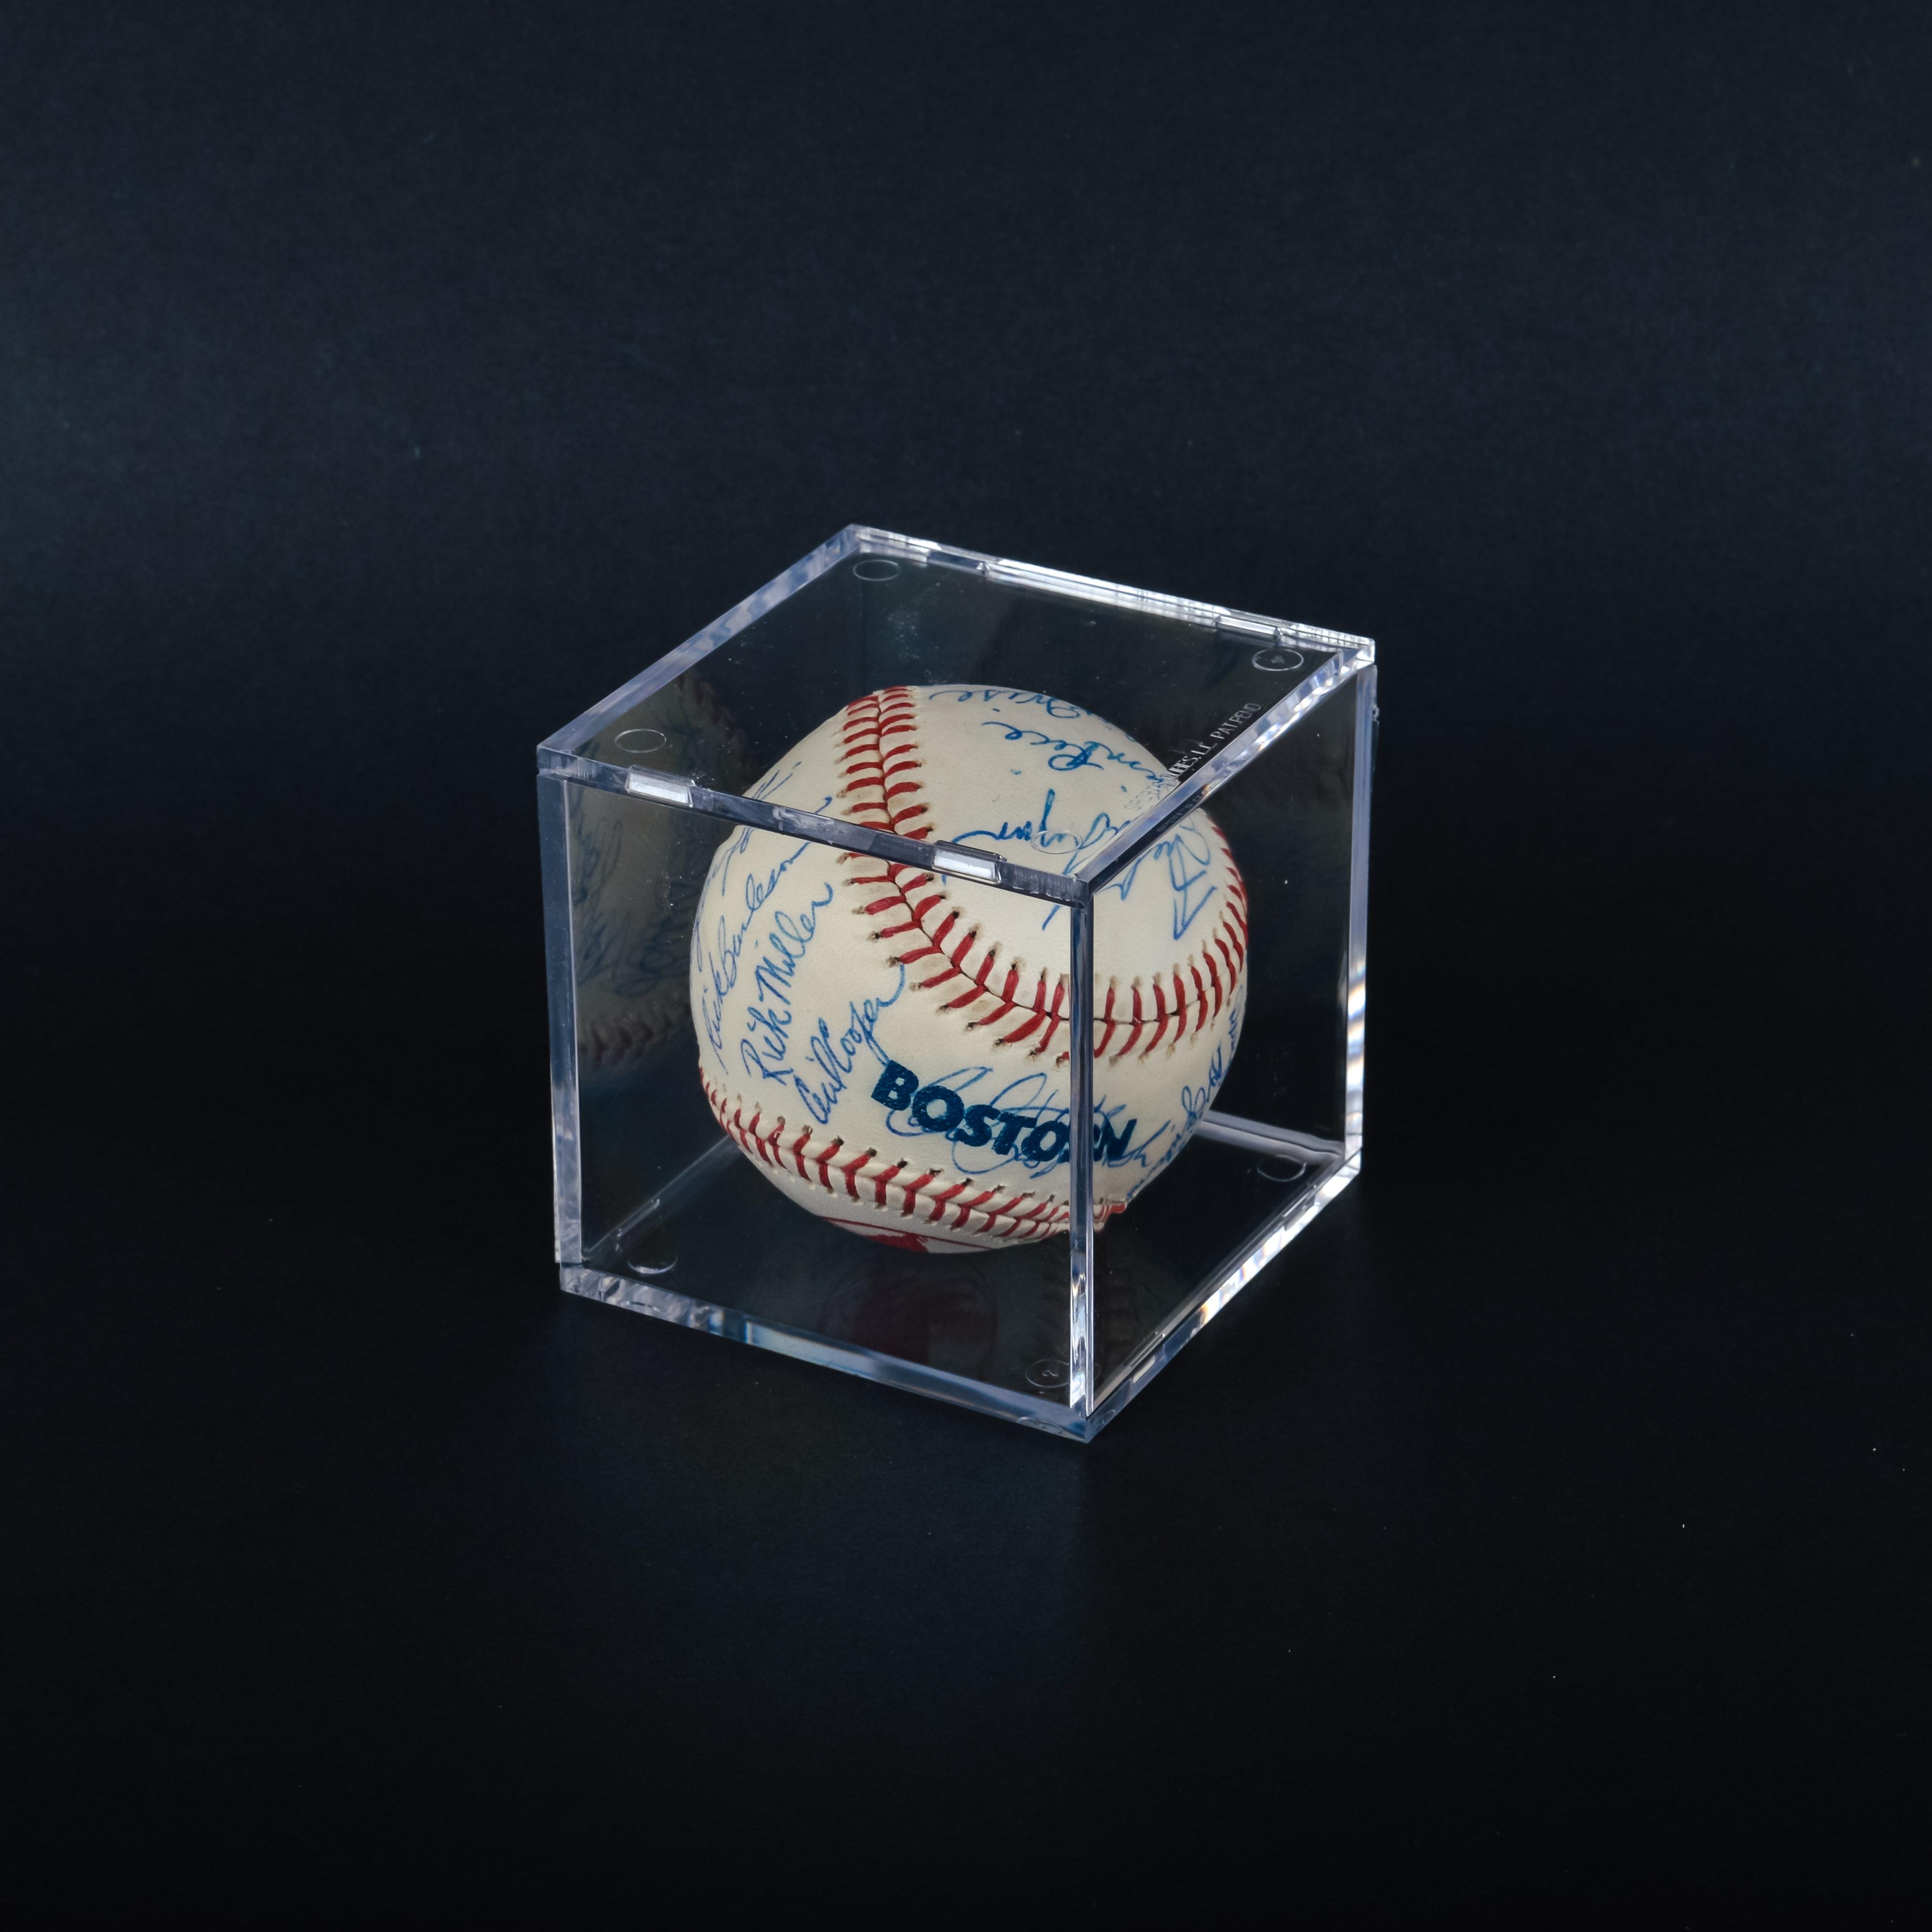 Autographed 1976 Boston Red Sox Baseball